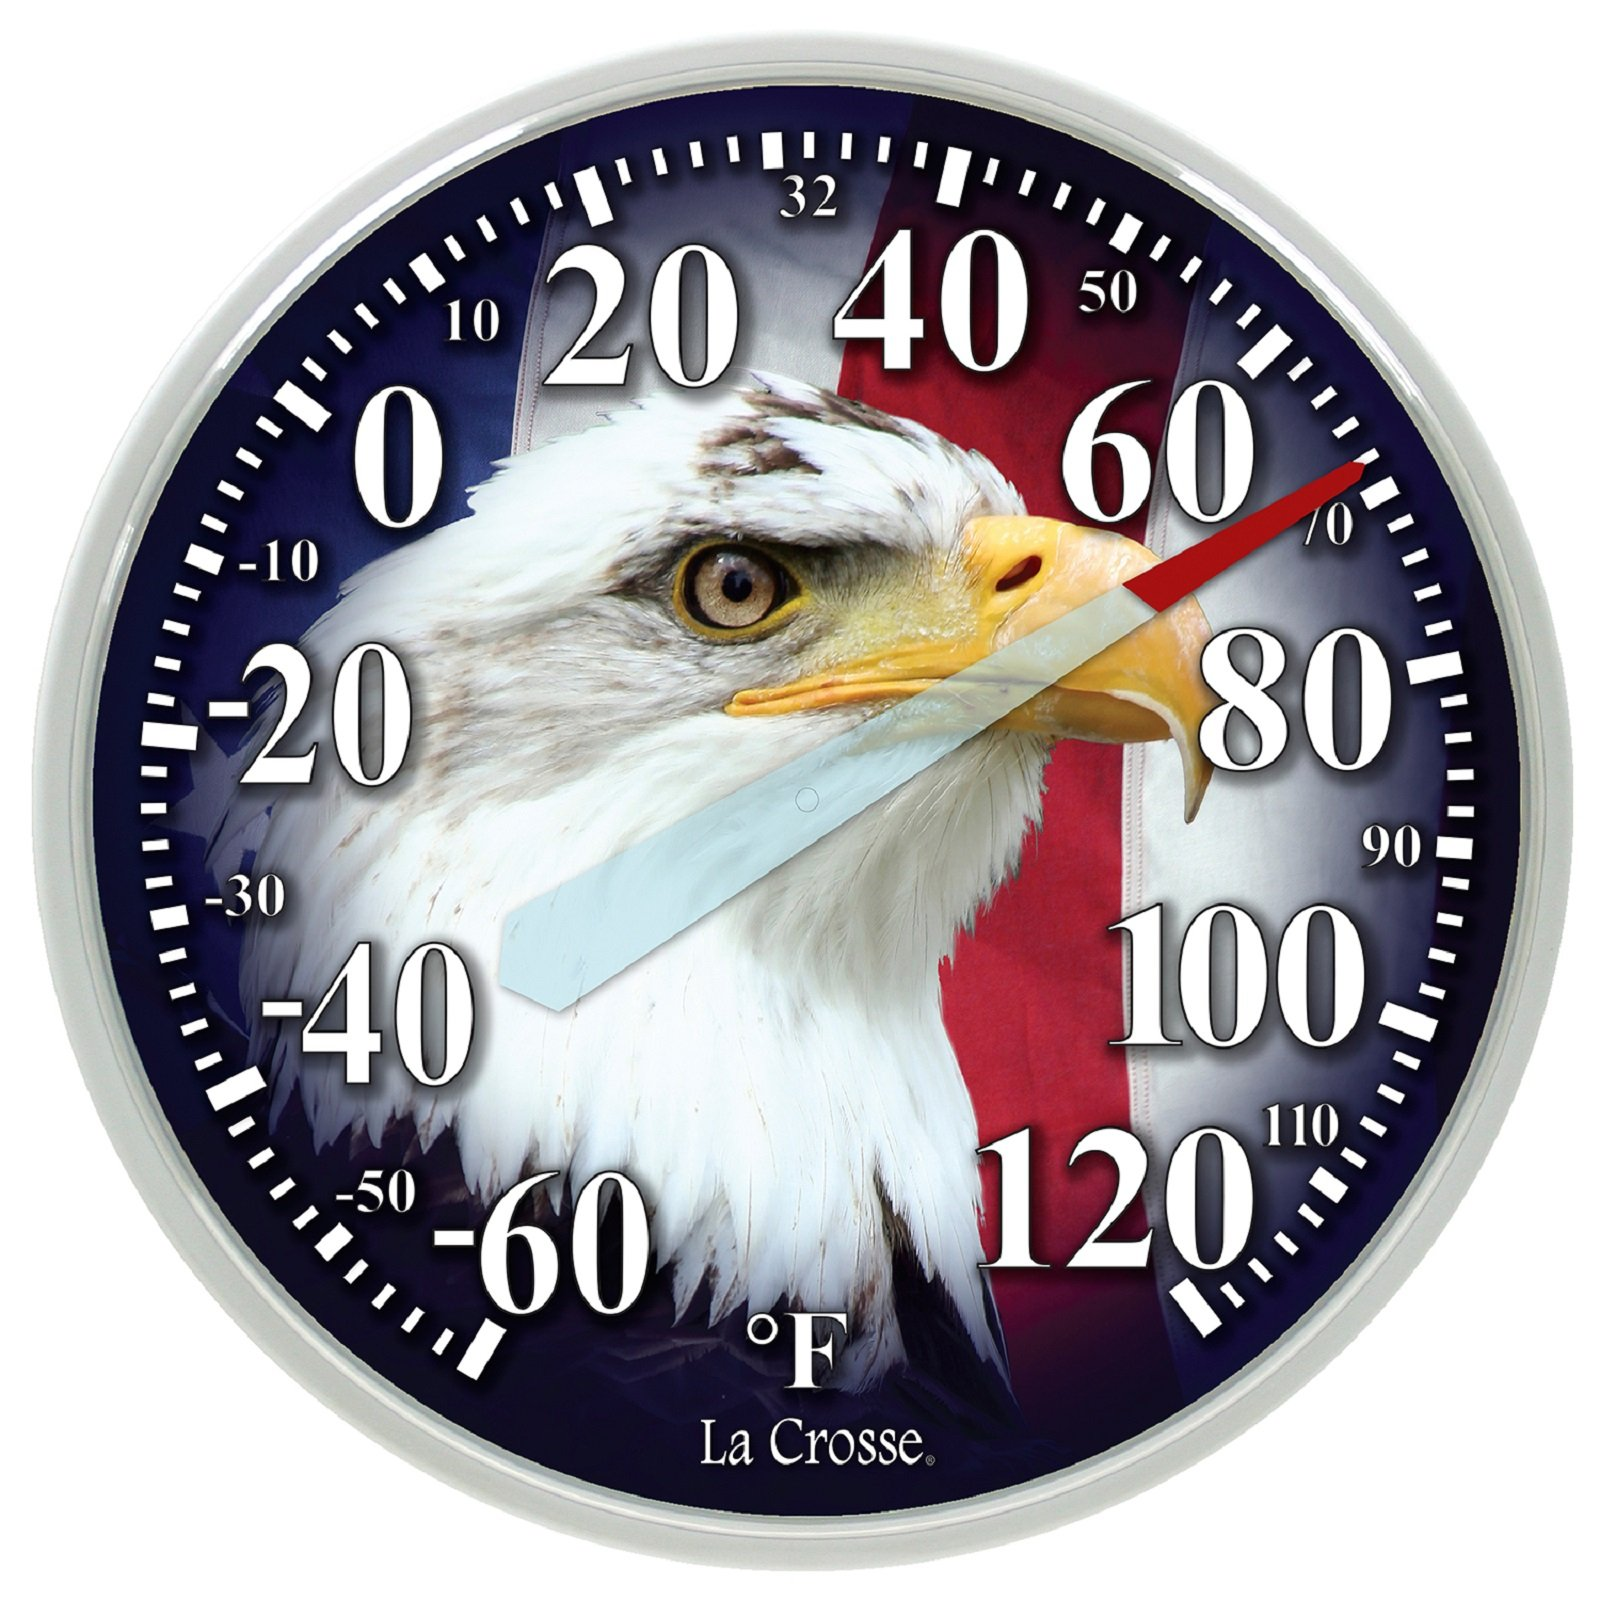 La Crosse 13.5'' Dial Outdoor Thermometer - Eagle